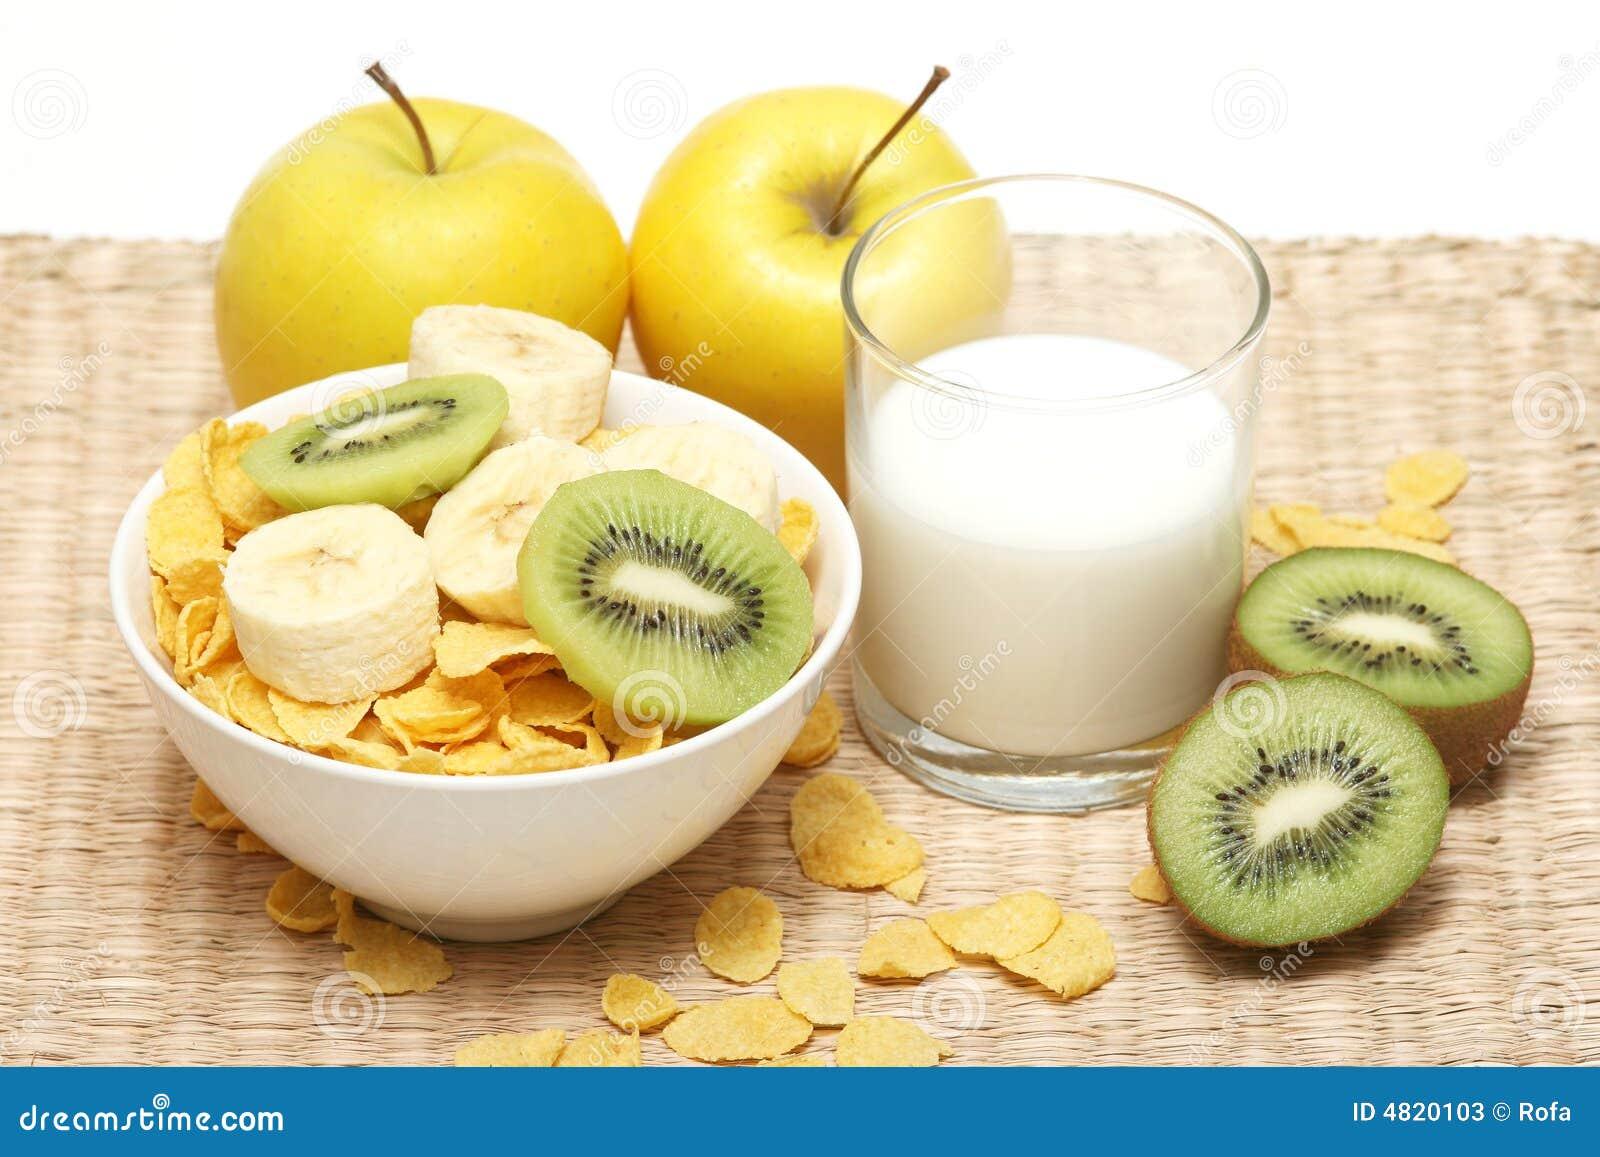 cereal-milk-4820103.jpg